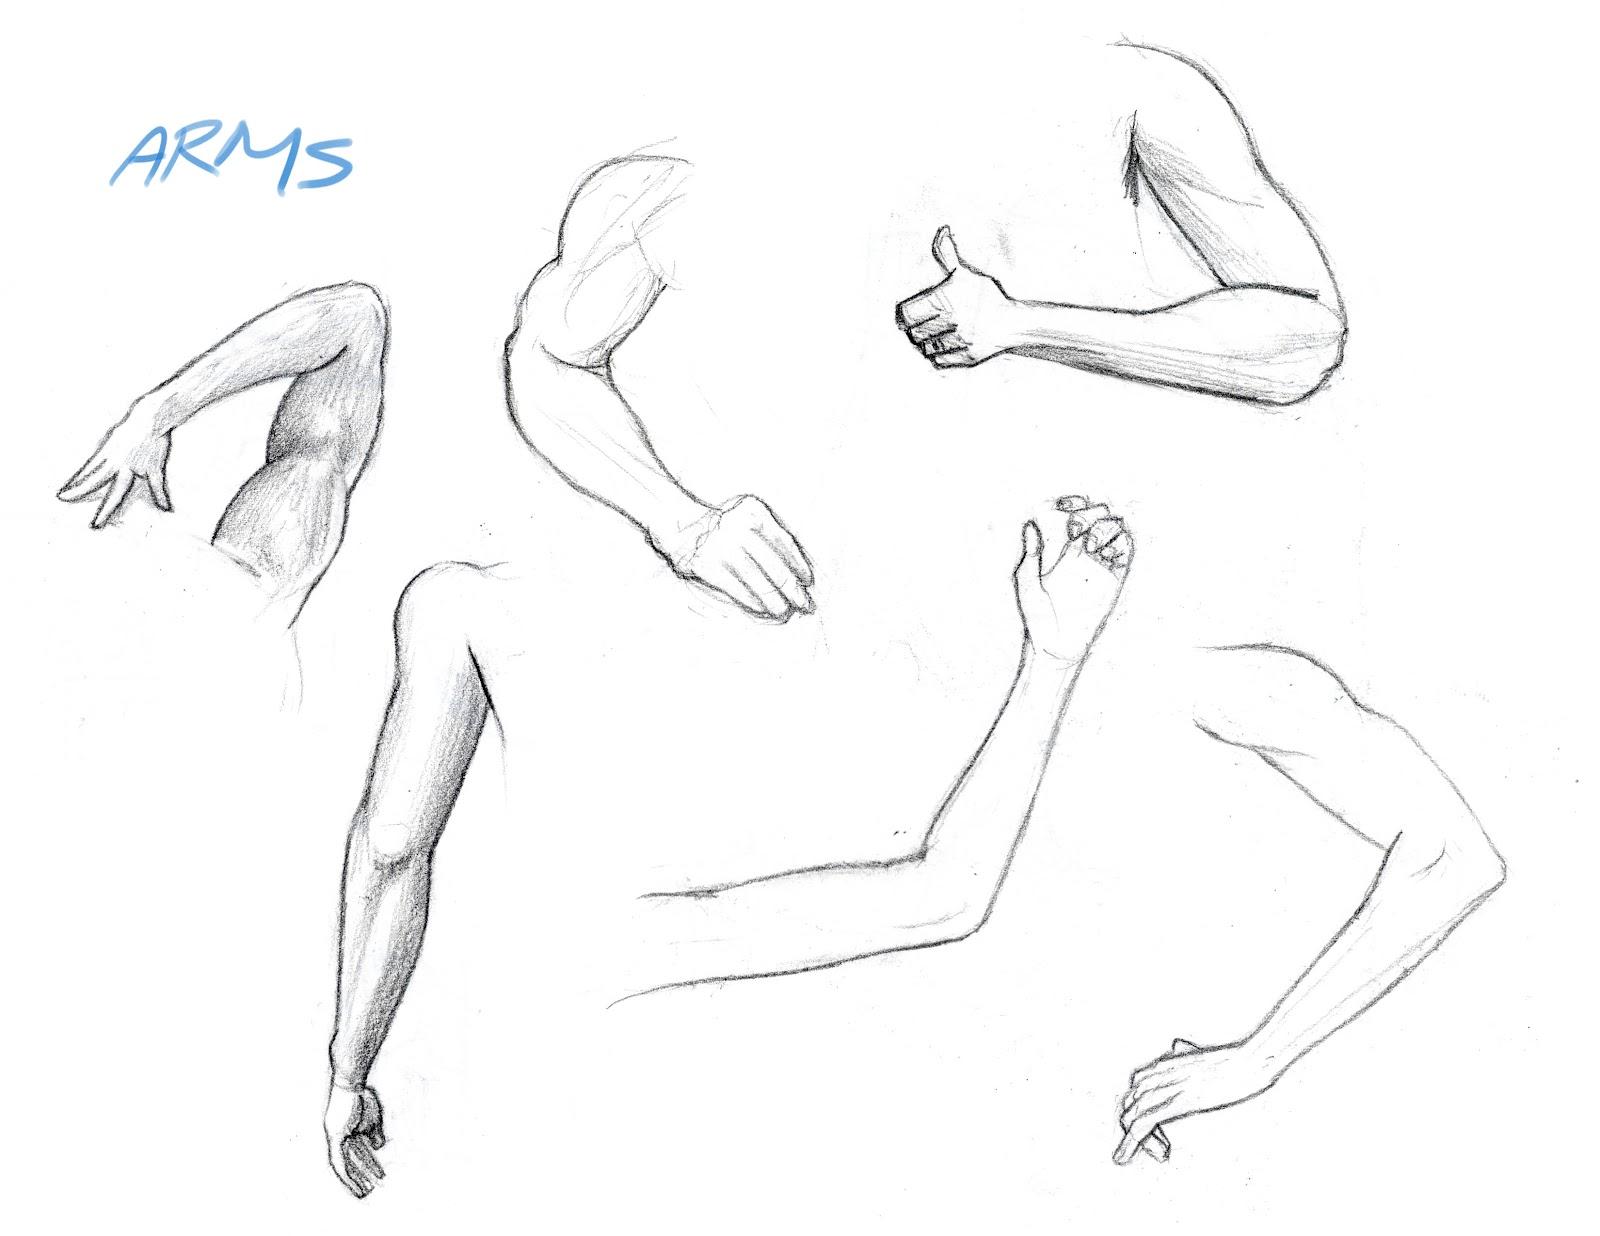 Arash Rod S Art Arms And Legs Drawings